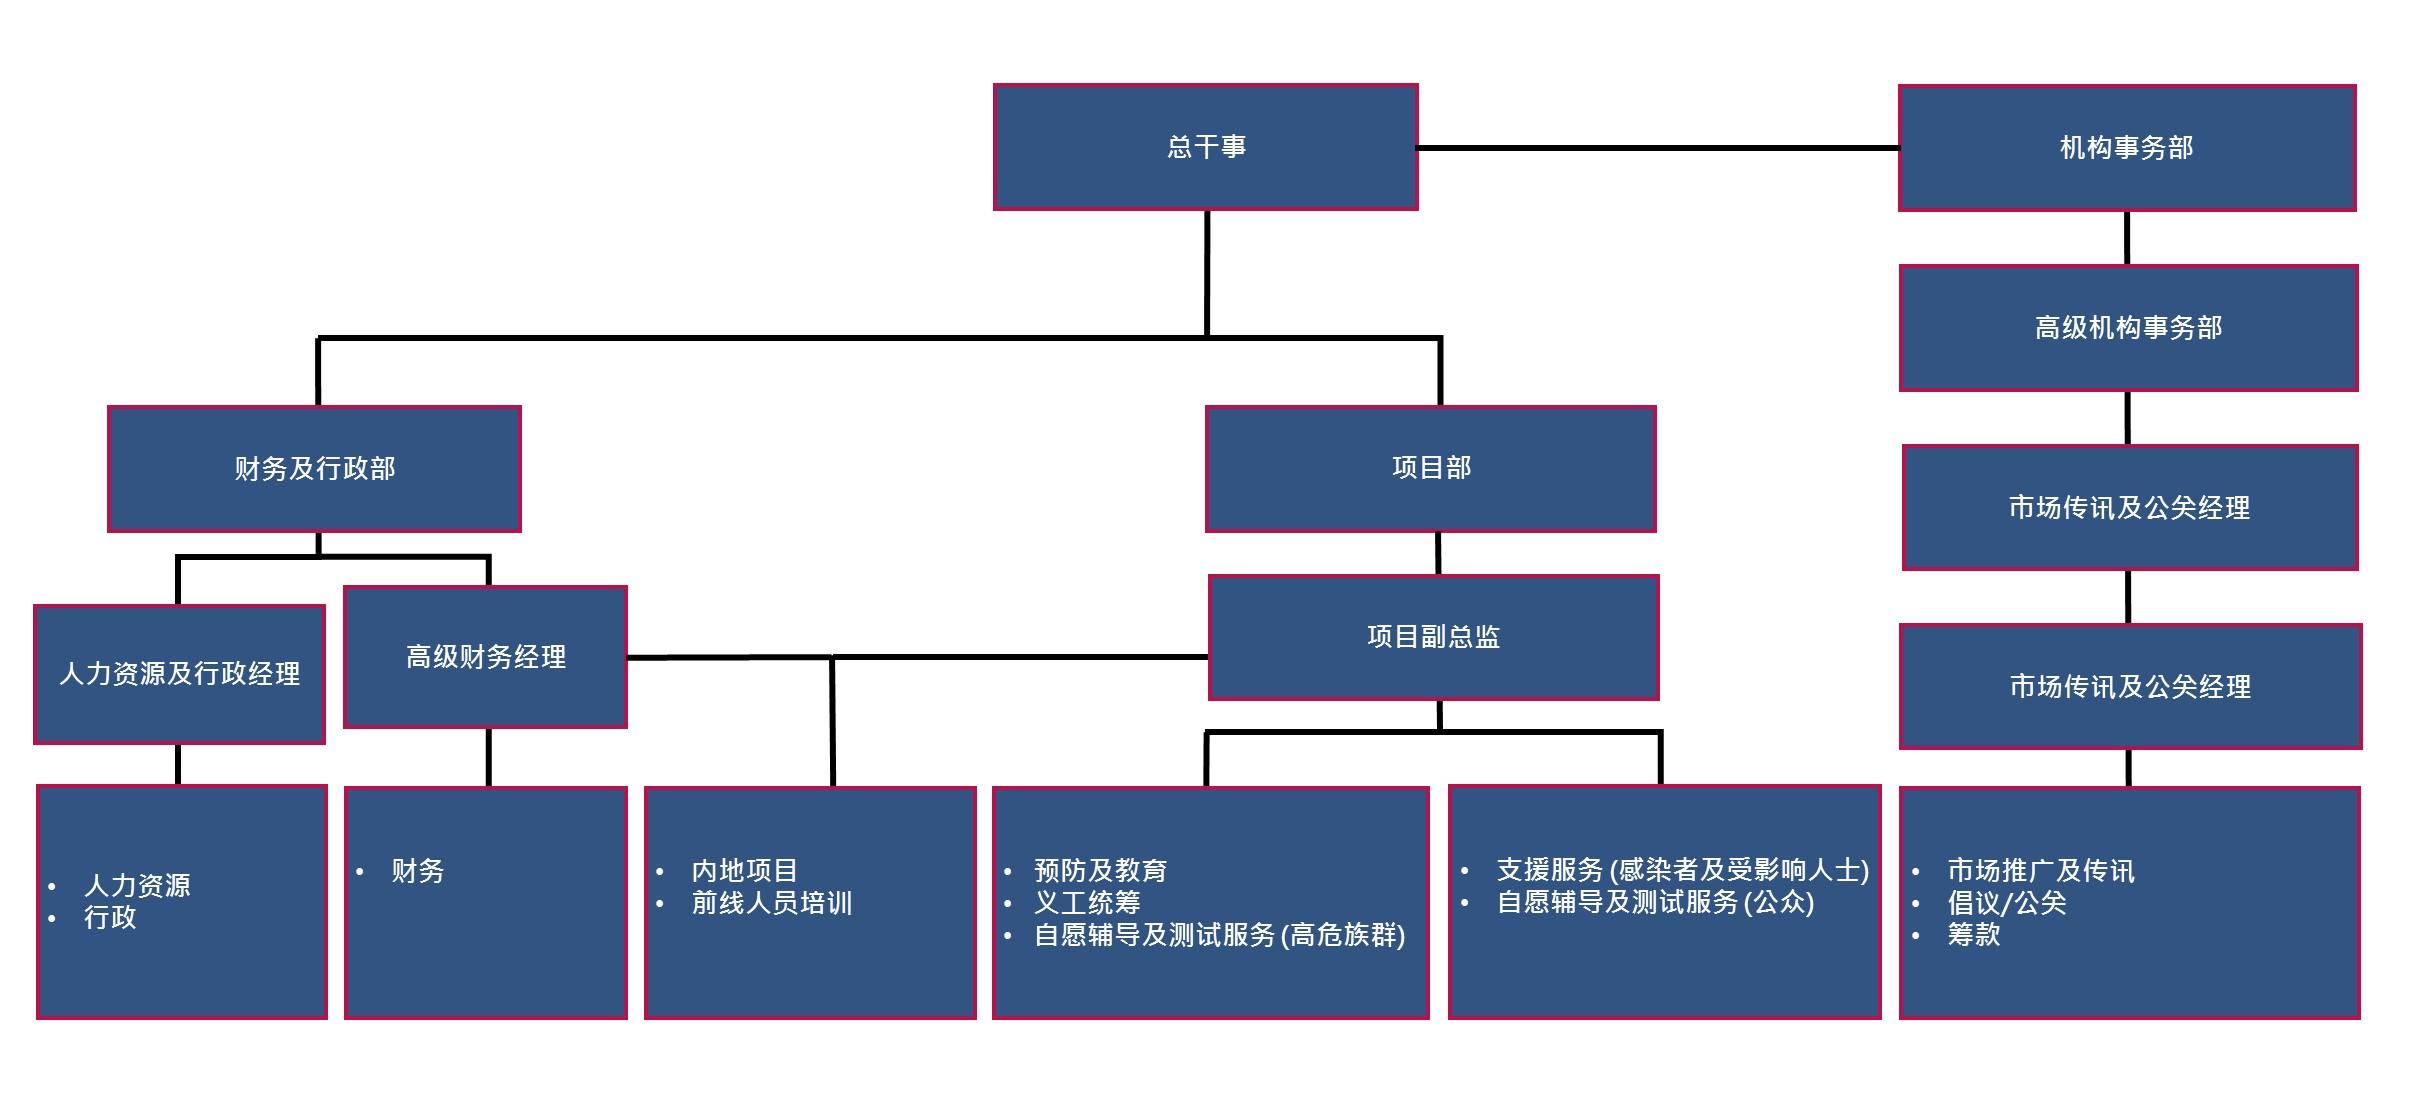 Sim Chi chart